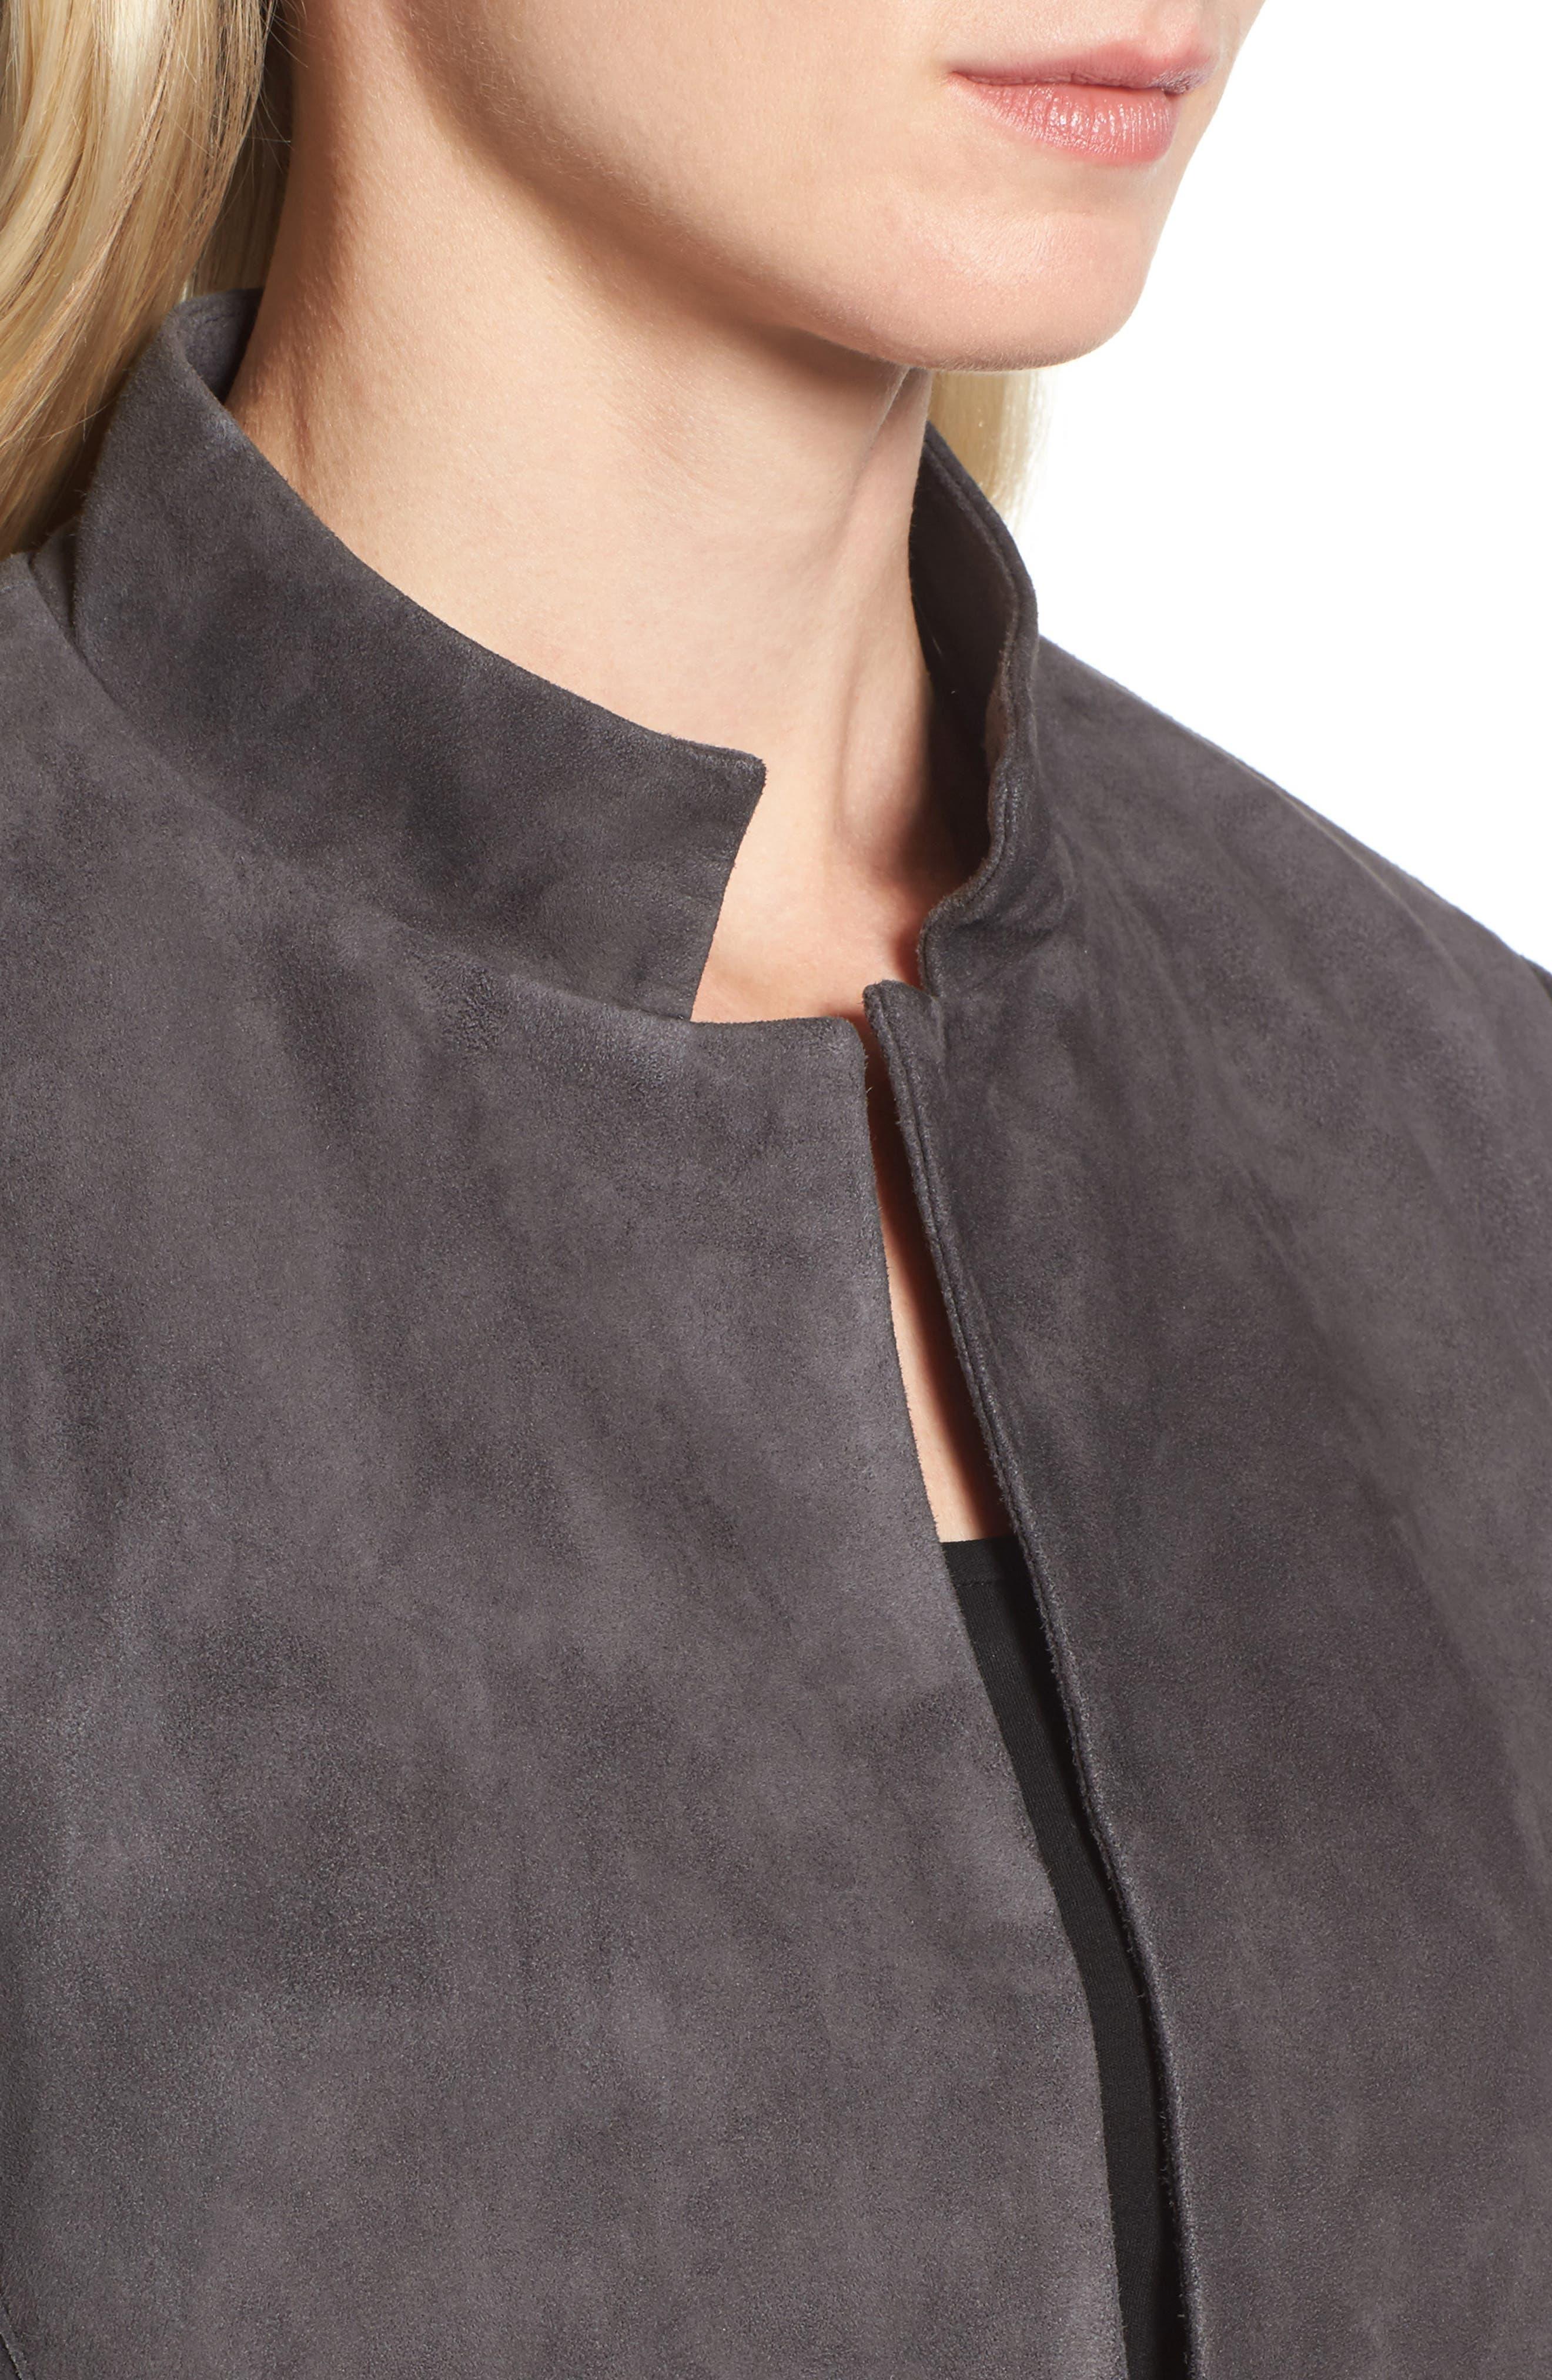 Suede Jacket,                             Alternate thumbnail 4, color,                             Bark